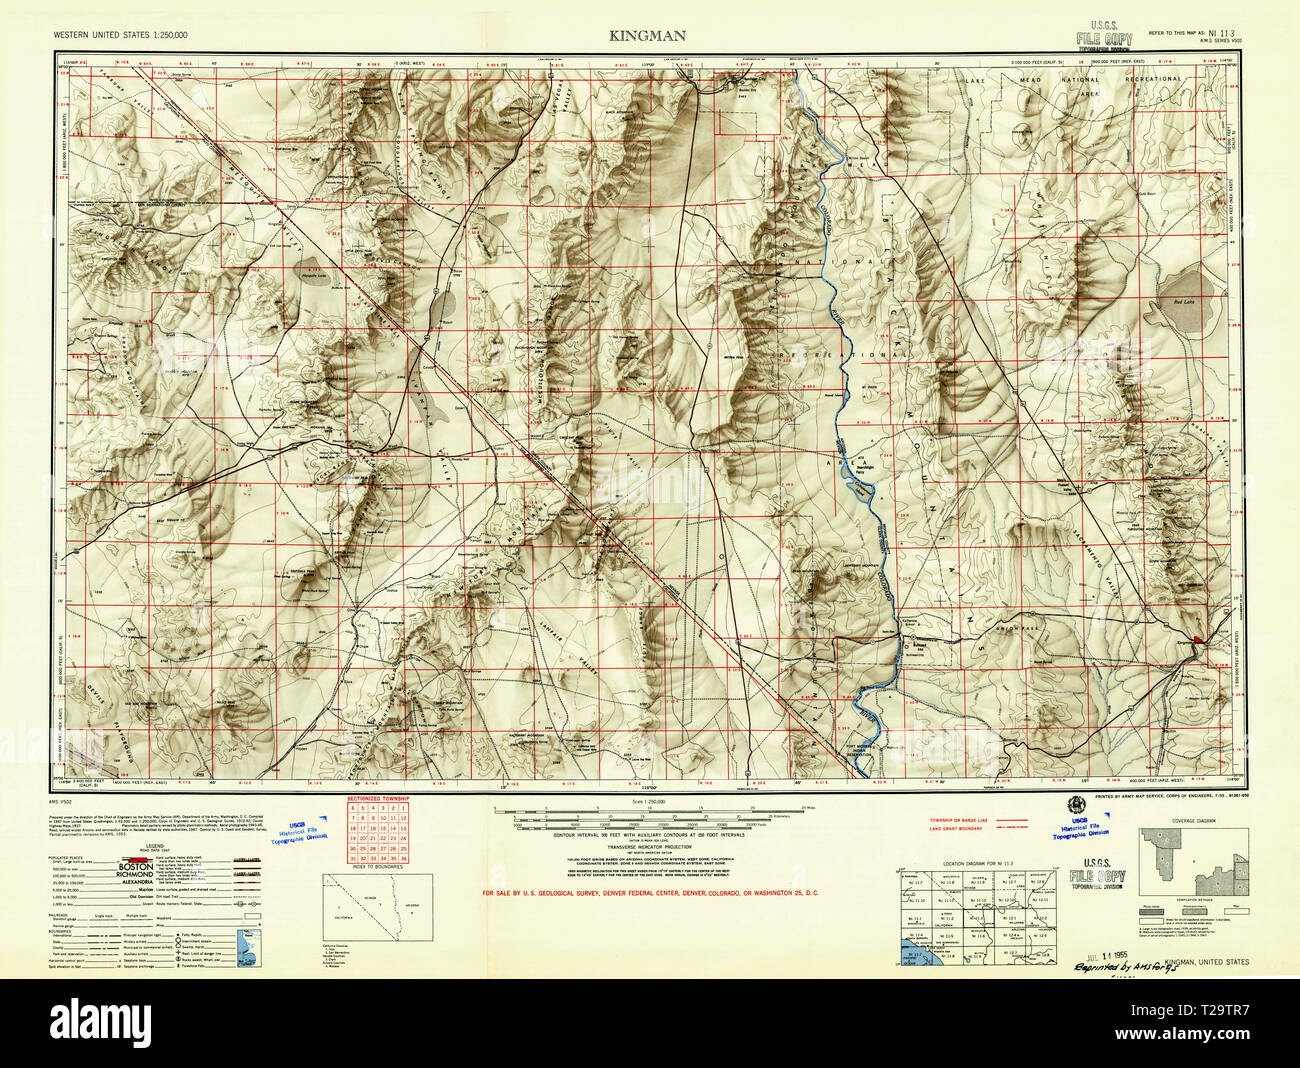 Map Of Arizona Kingman.Usgs Topo Map Arizona Az Kingman 315522 1955 250000 Restoration